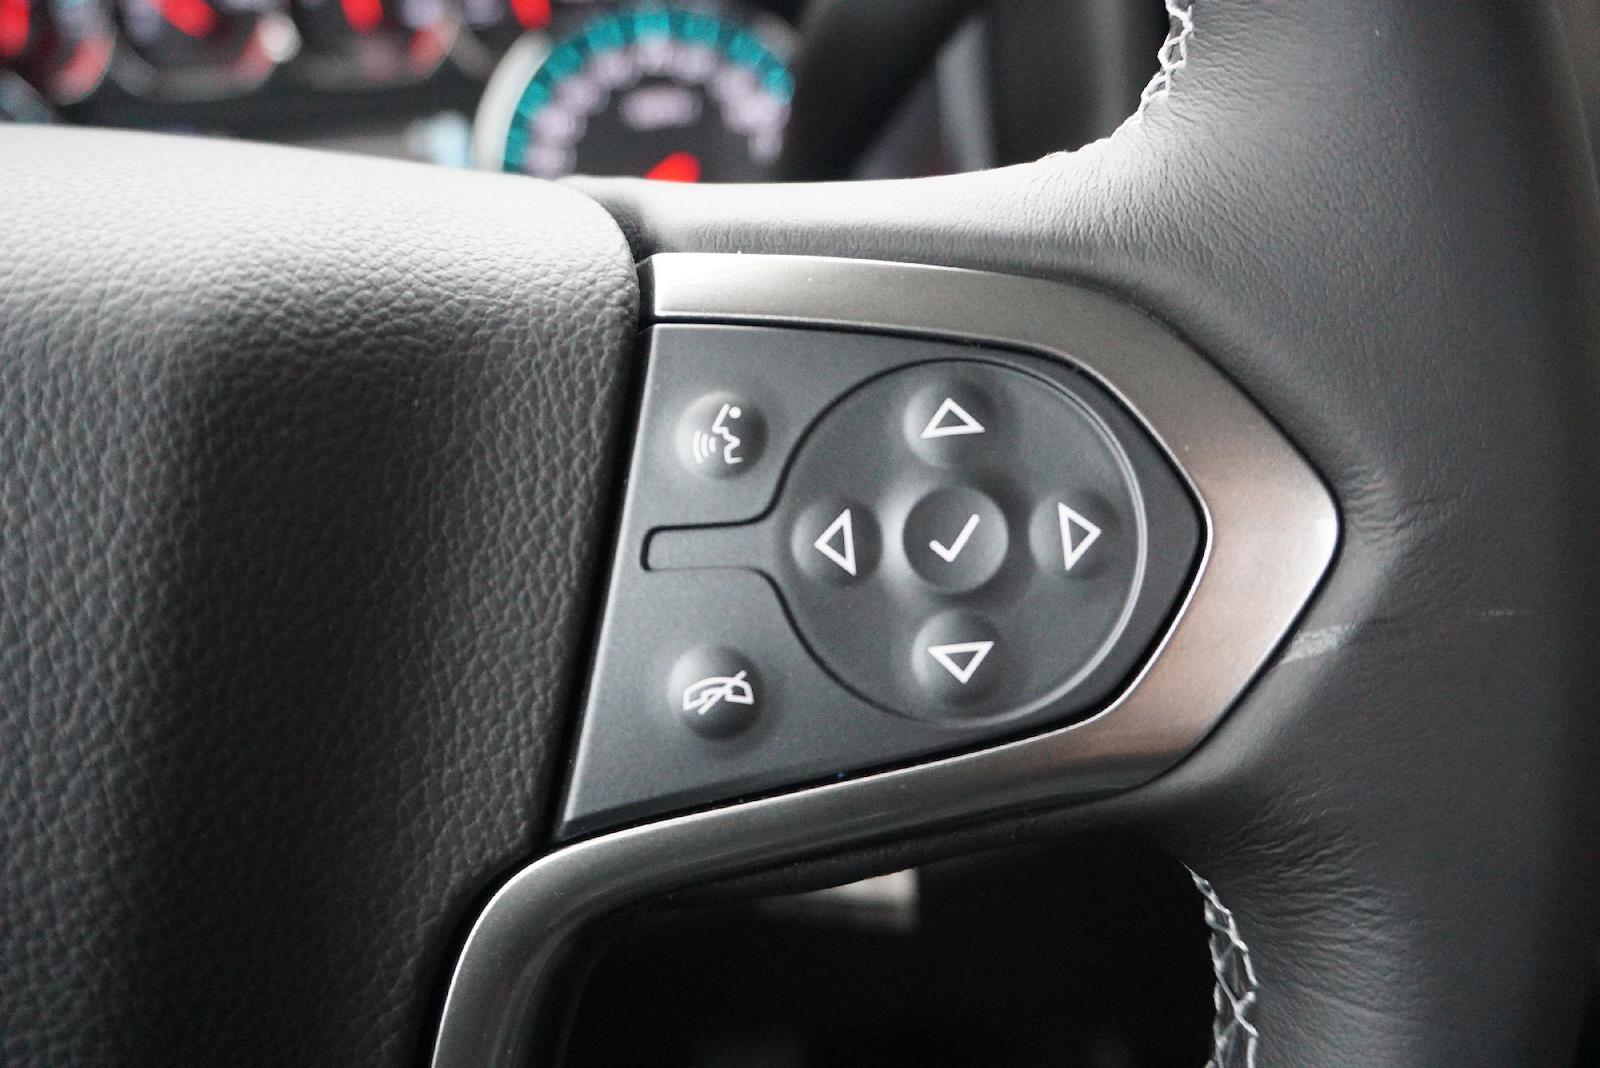 2019 Chevrolet Silverado 5500 Regular Cab DRW 4x2, Rollback Body #91052 - photo 21